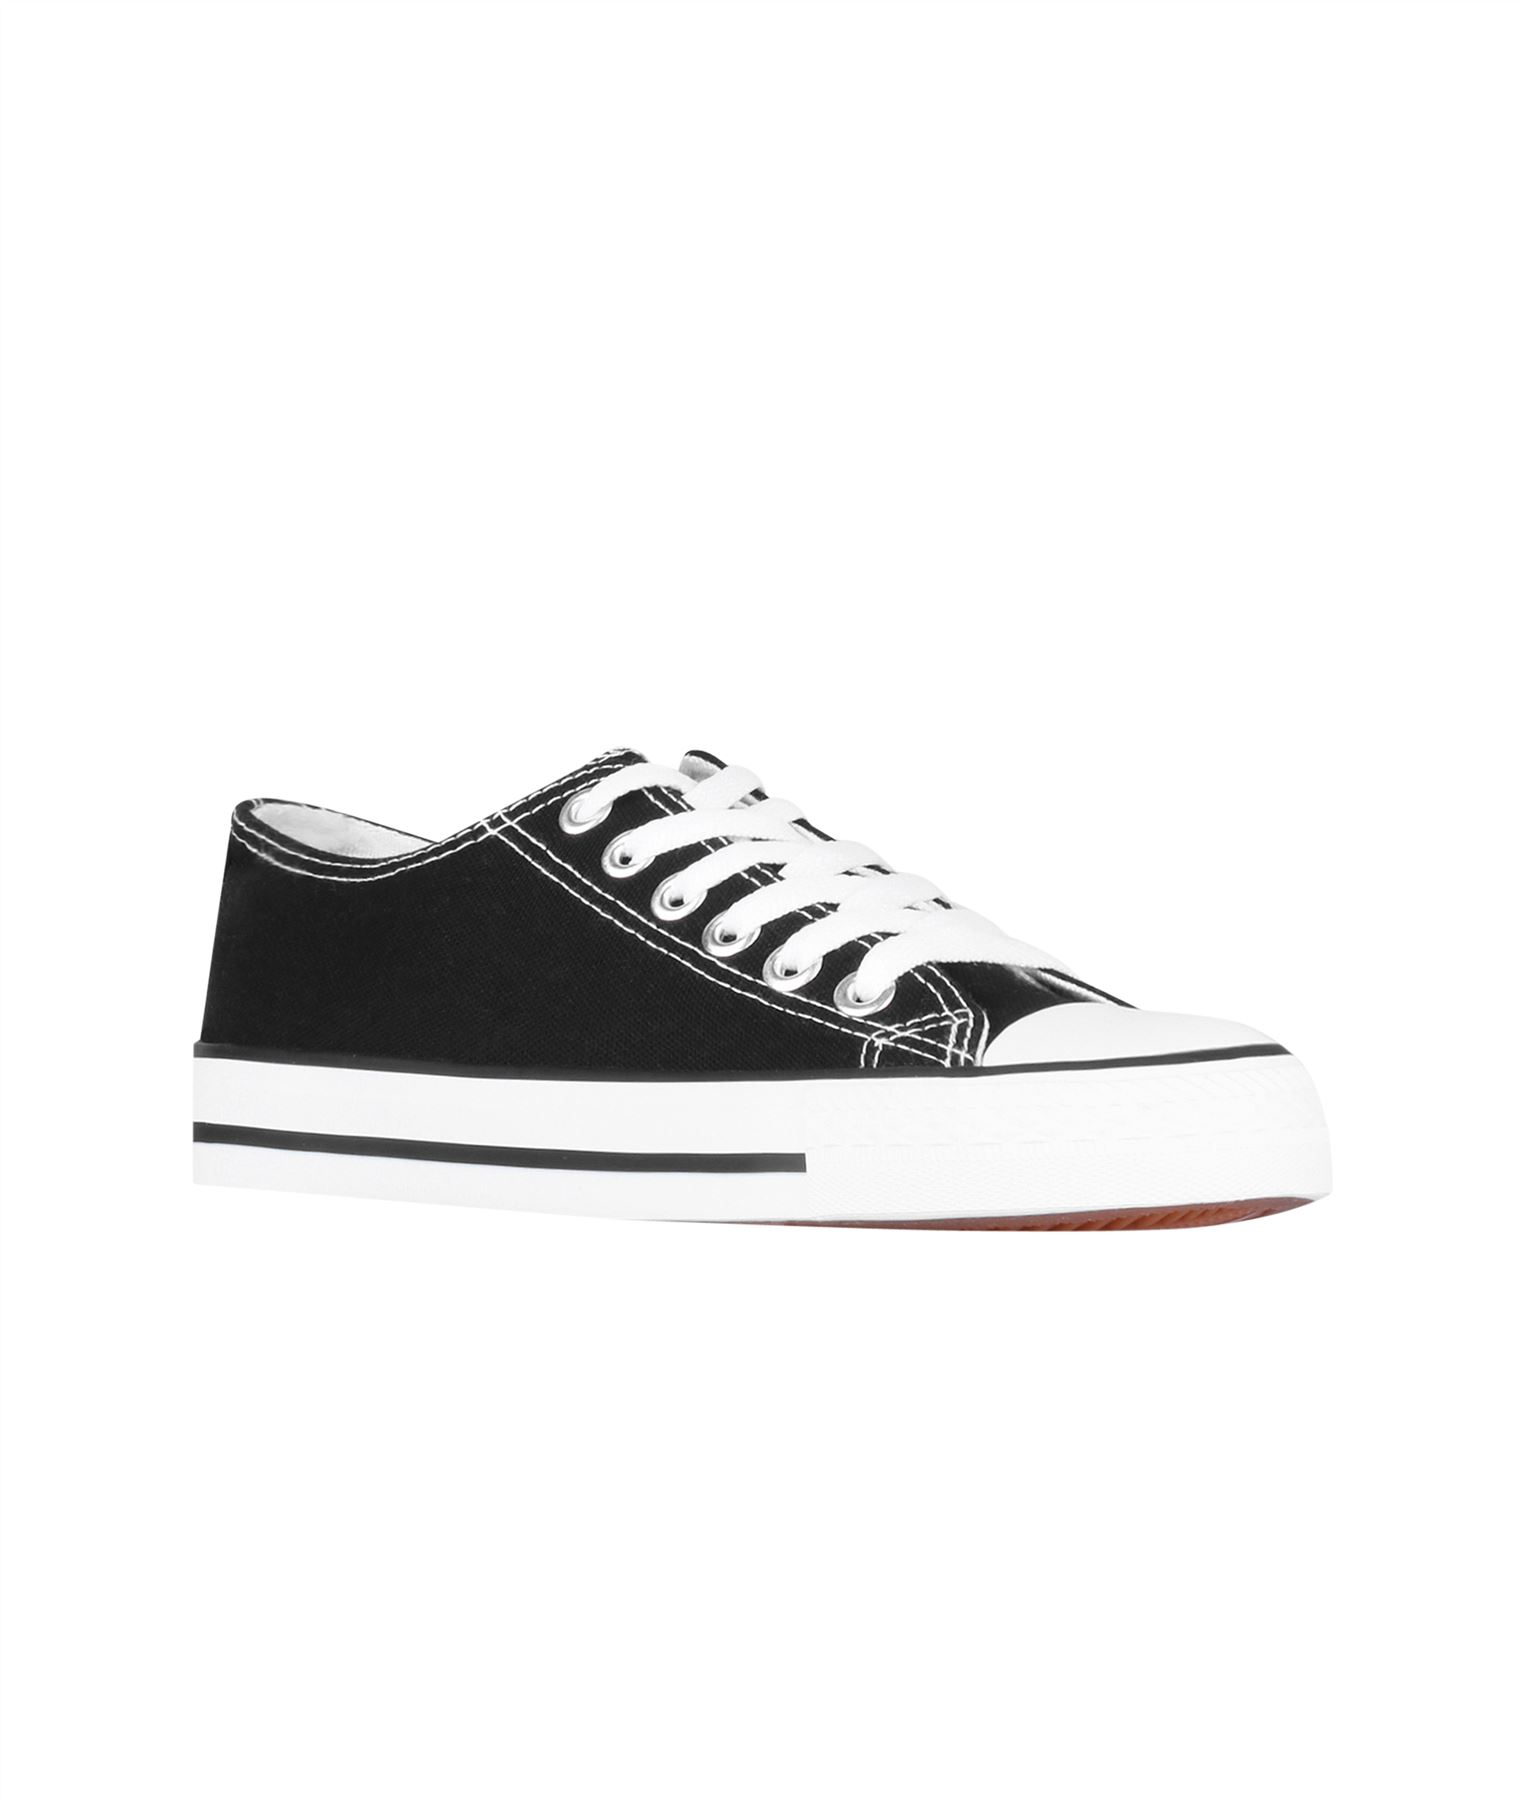 Zapatillas-Mujer-Casuales-Deportiva-Barata-Lona-Moda-Originales-Outlet-Tela-Moda miniatura 33